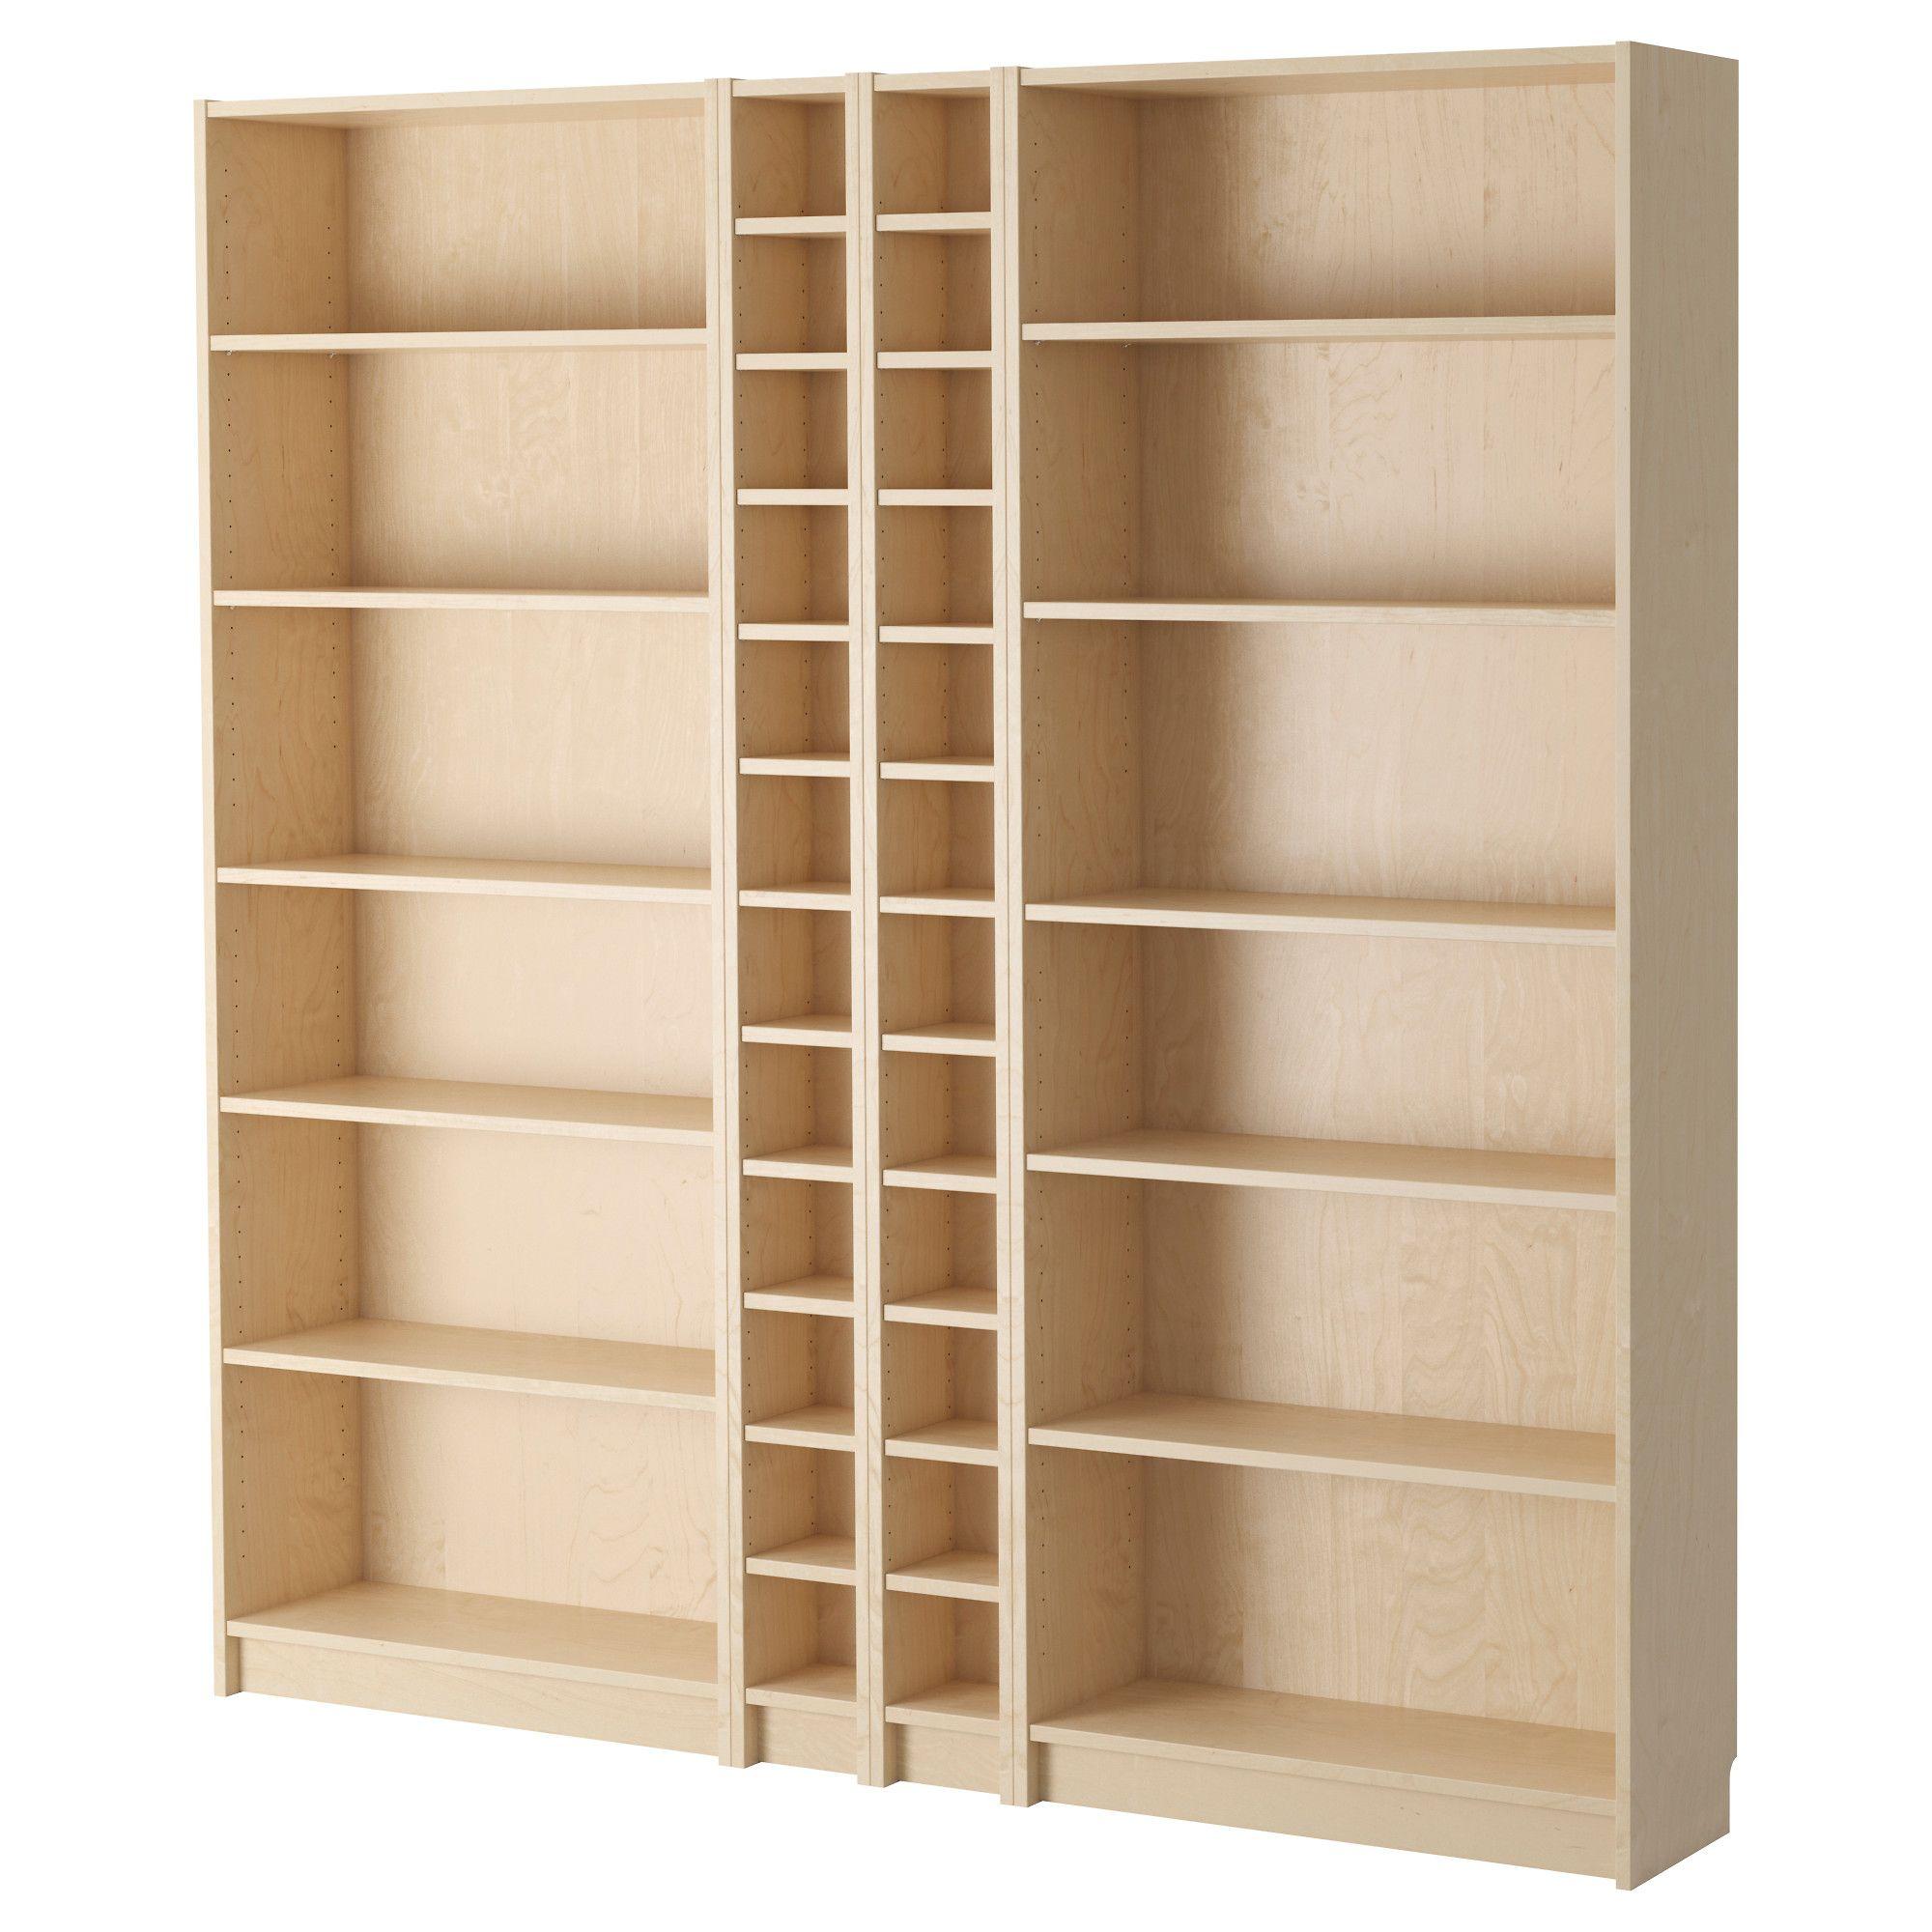 Billy Gnedby Bookcase Birch Veneer 78 3 4x11x79 1 2 Ikea Billy Bookcase Ikea